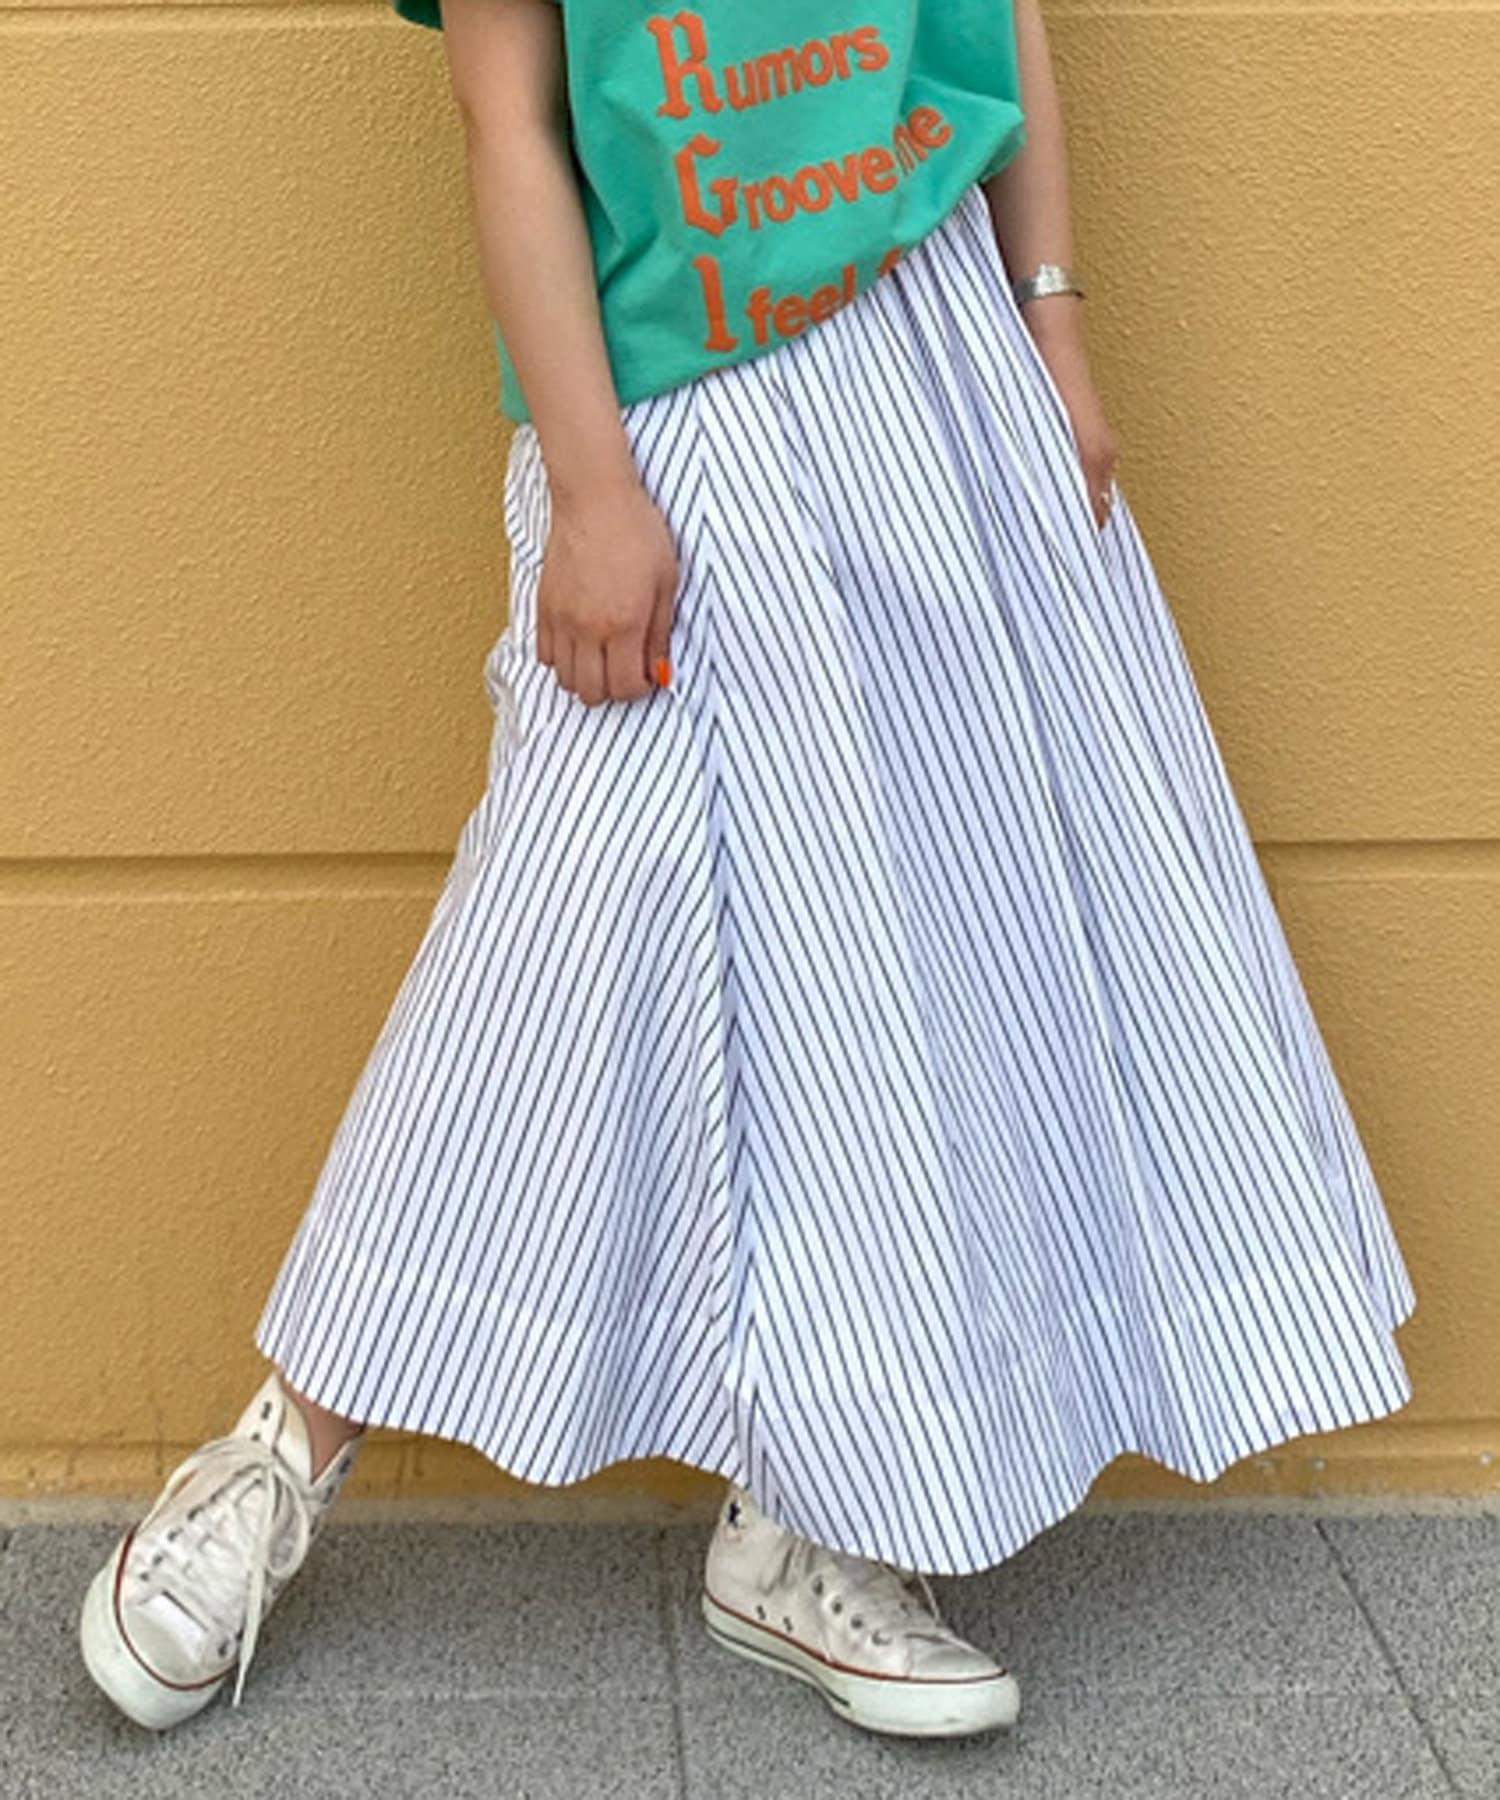 BONbazaar(ボンバザール) 《セットアップ推奨》ストライプギャザースカート